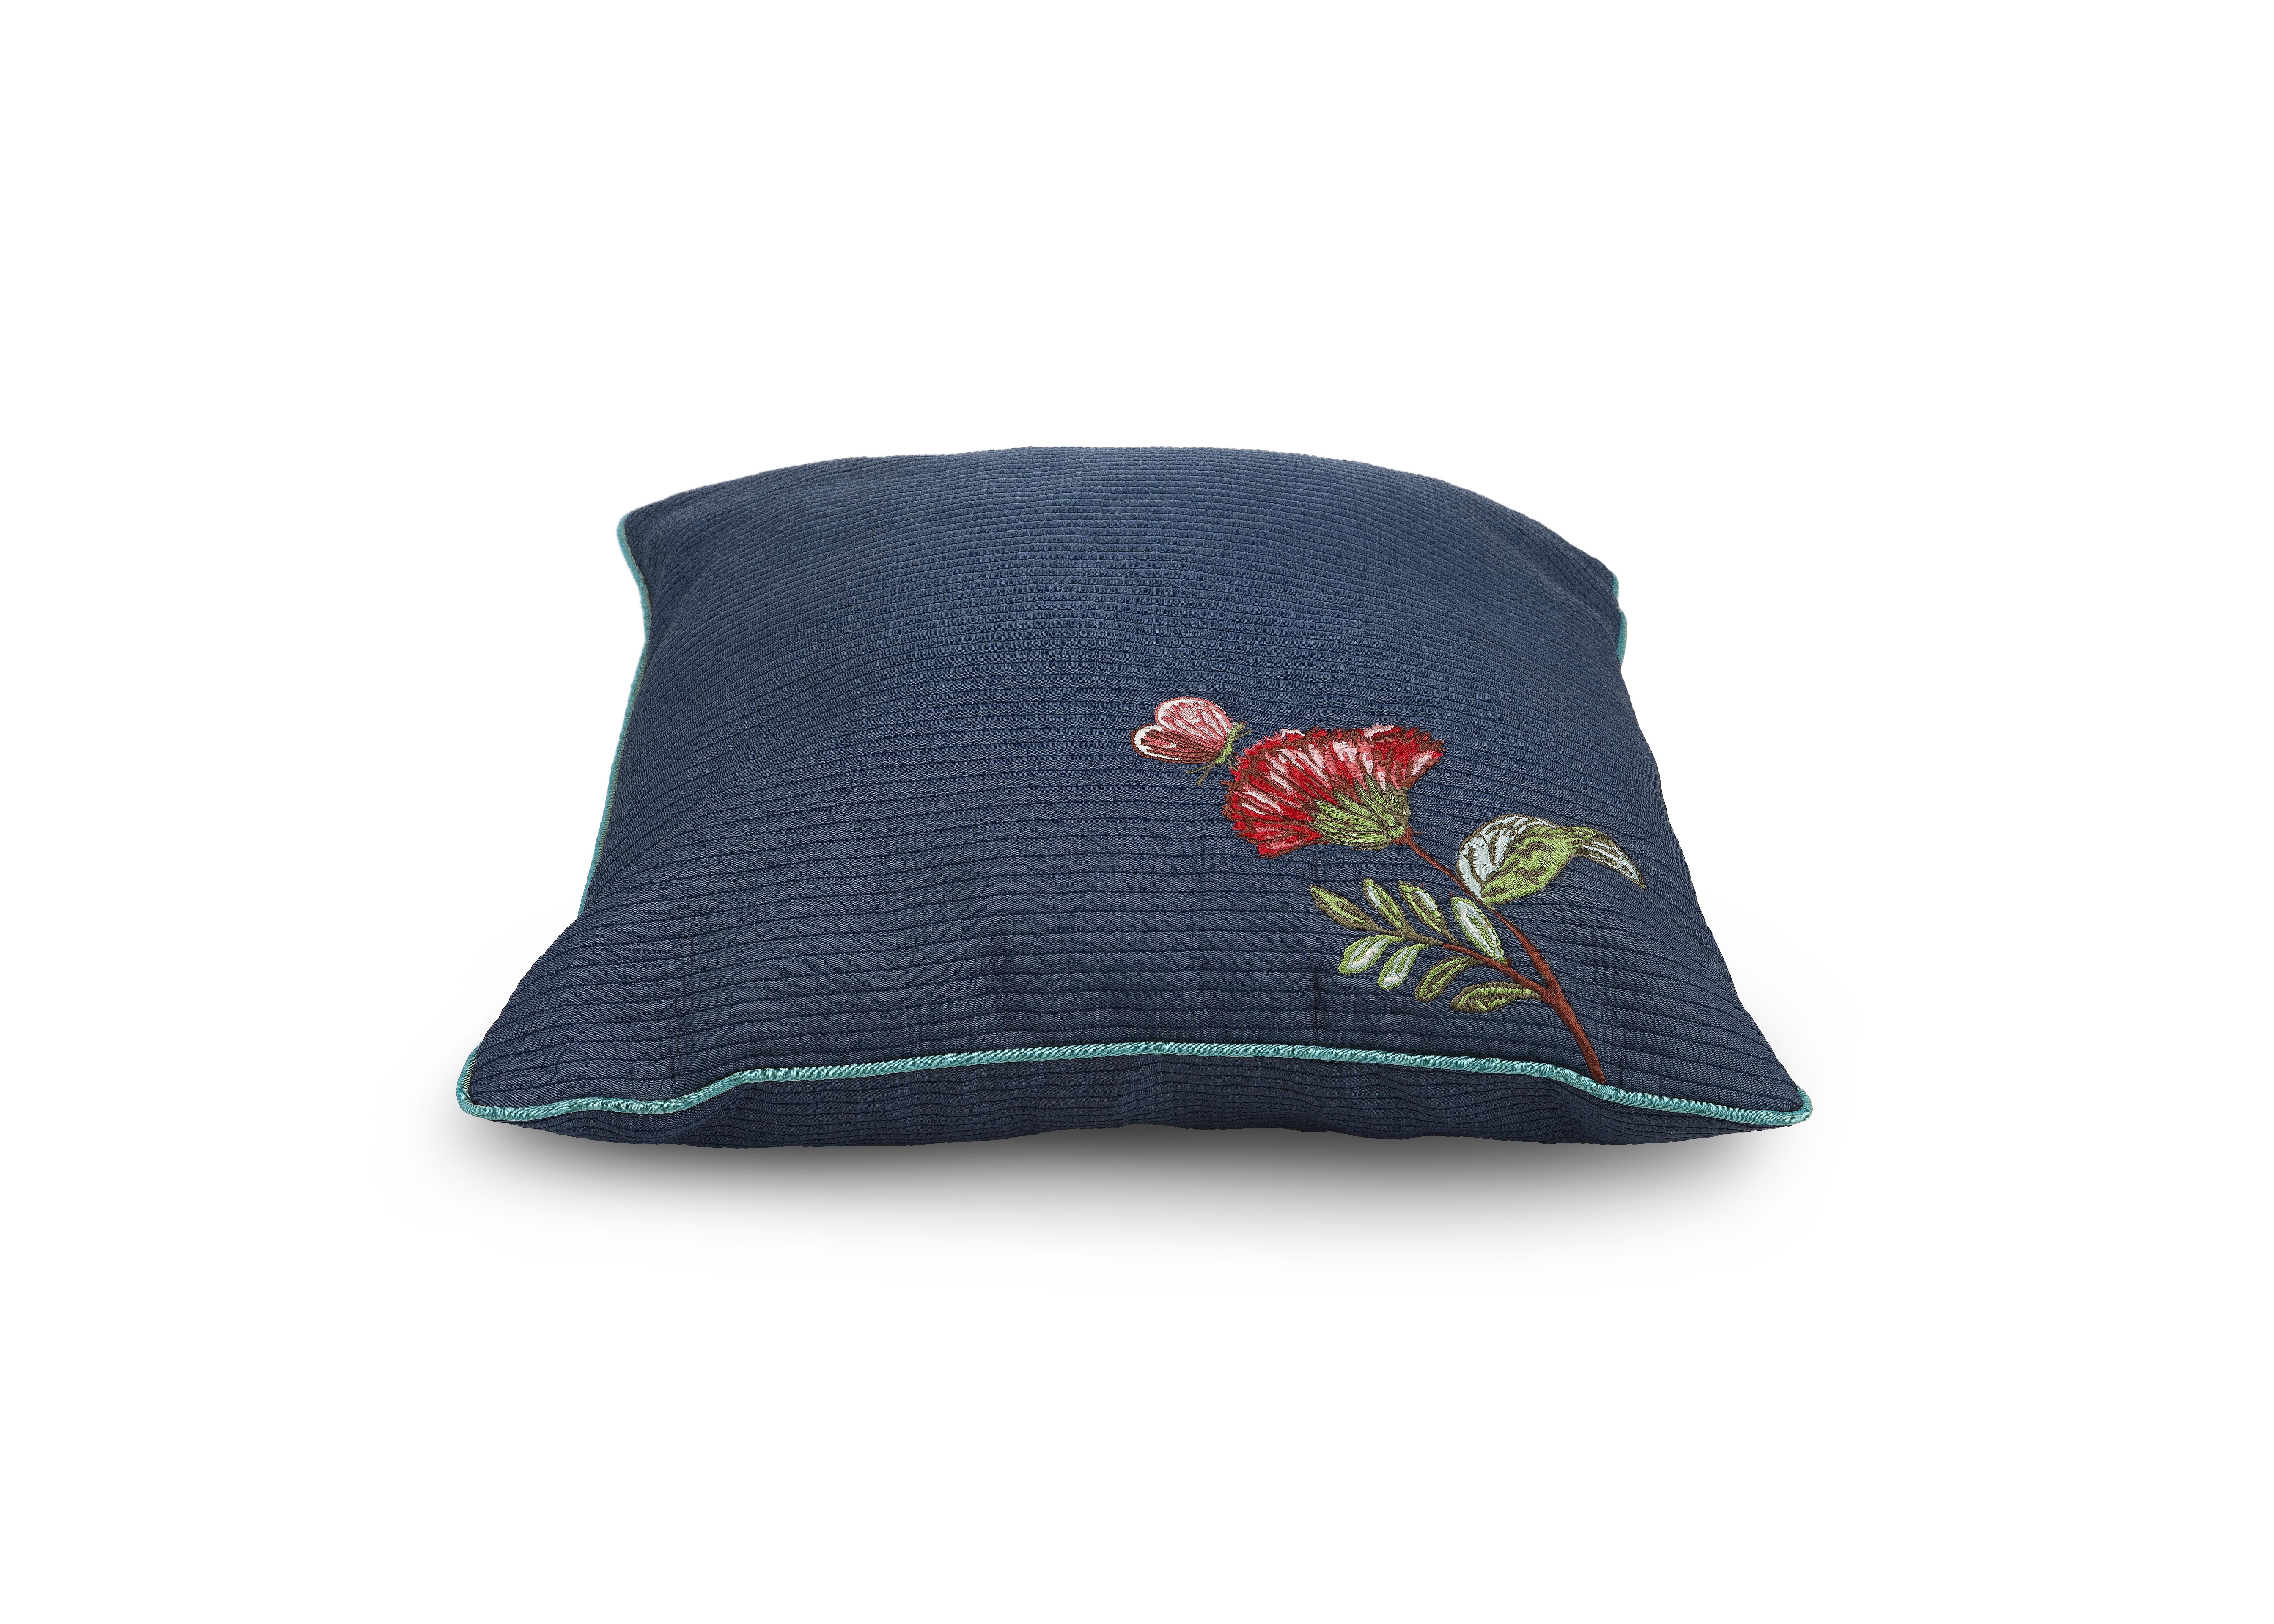 Подушка декоративная Pip studio Quilted, цвет: синий, 40 х 40 см happy baby музыкальный брелок pip pip keys